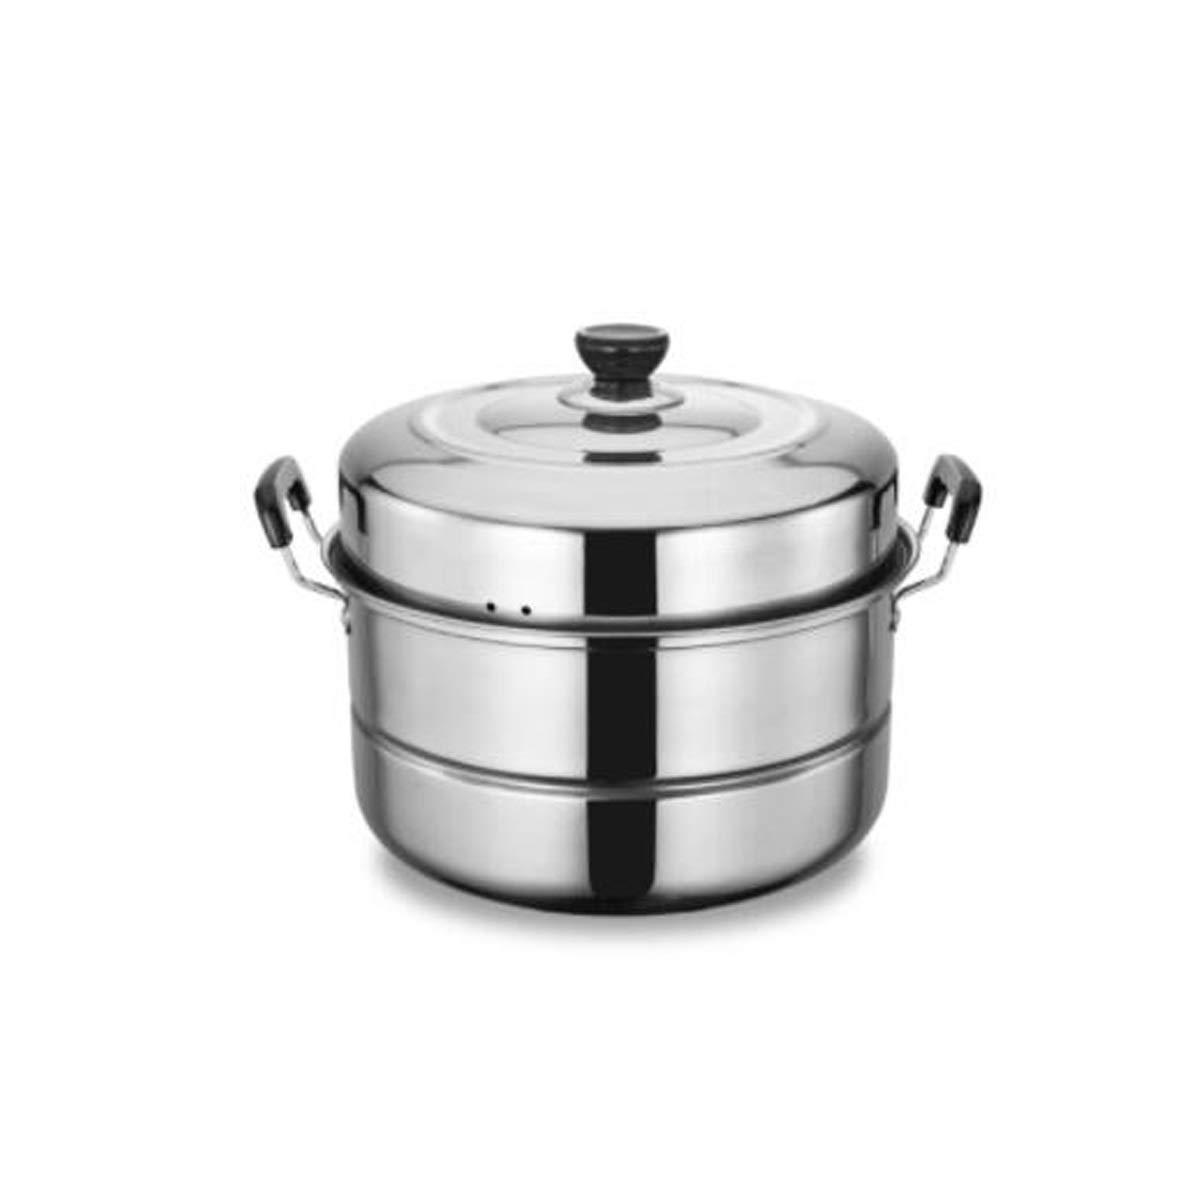 conveniente plata 32cm 32cm 32cm Kaiyitong01 Vaporera, vaporera de dos capas de acero inoxidable, olla doble de acero inoxidable de 32 cm para el hogar, cocina de inducción, estufa de gas, pescado al vapor y panecillos al vapor  Más asequible